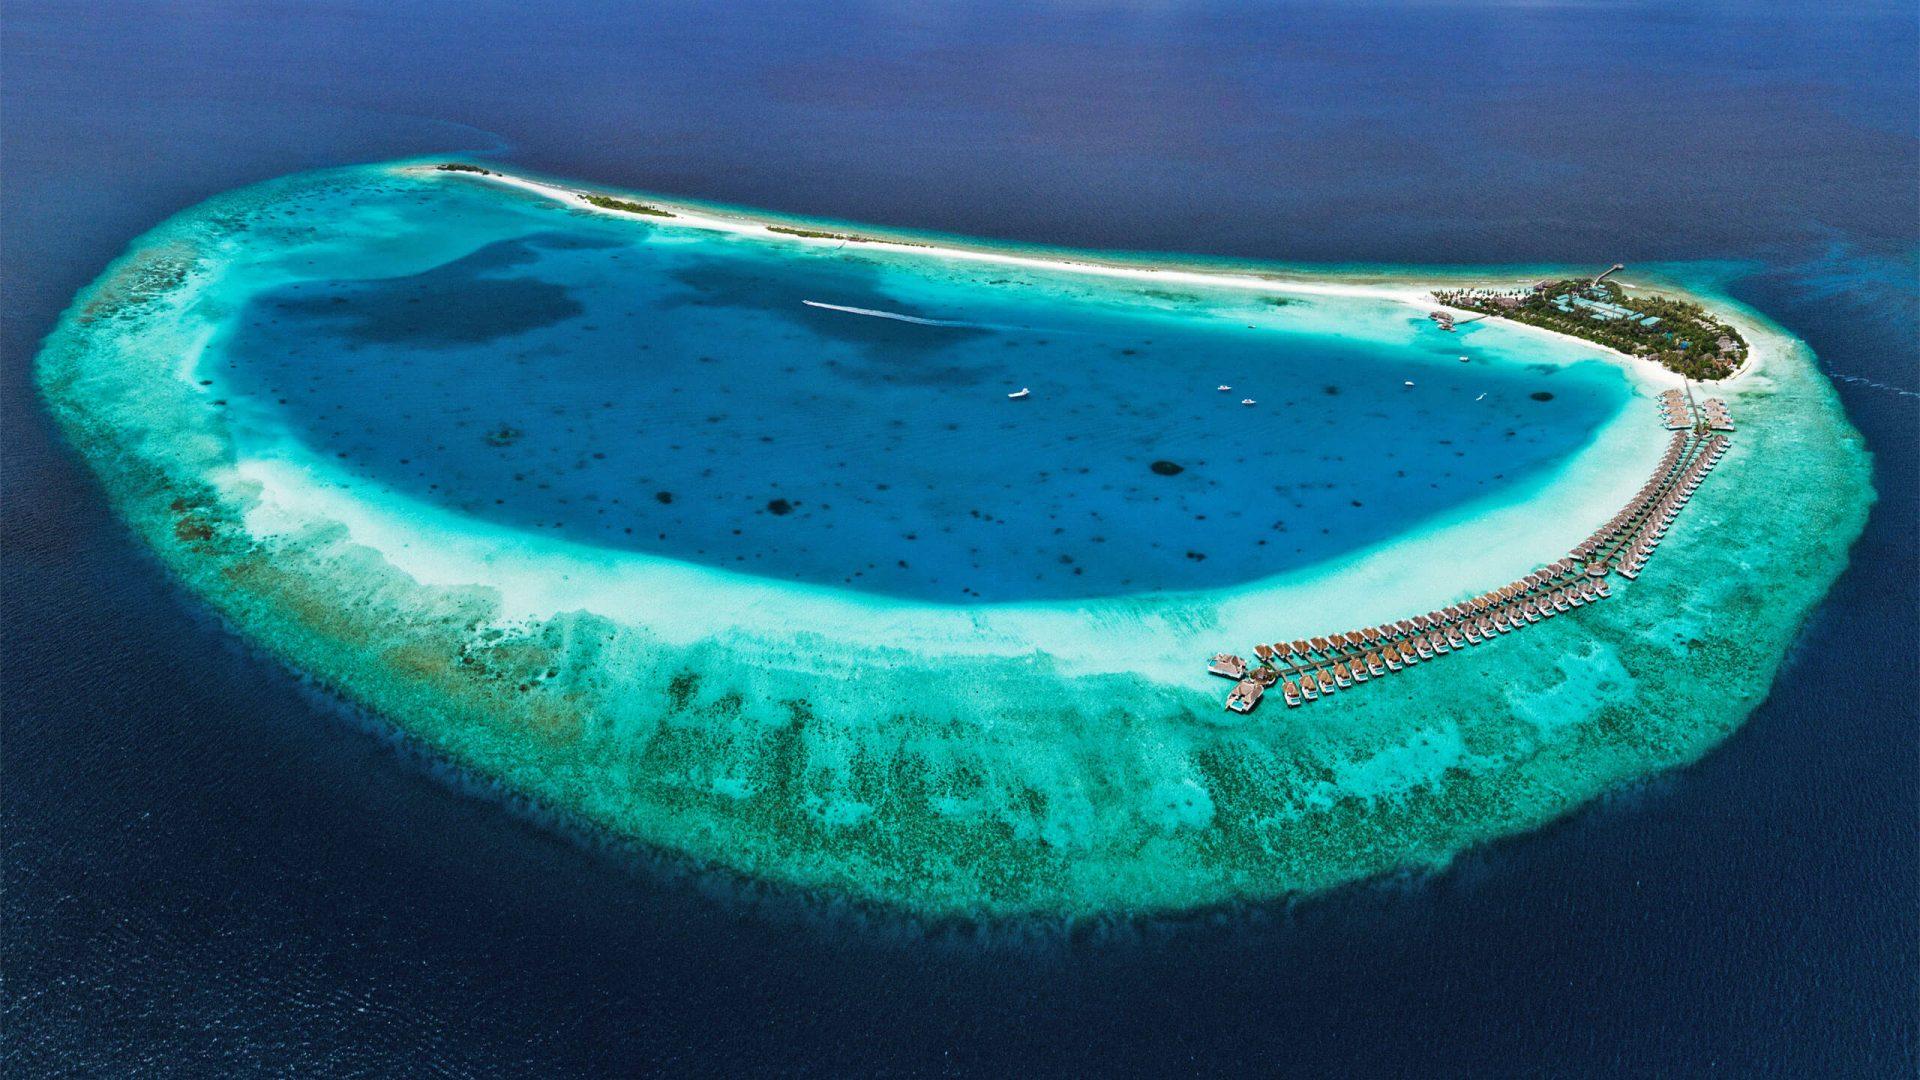 maldives-atoll-finolhu-reef-gallery